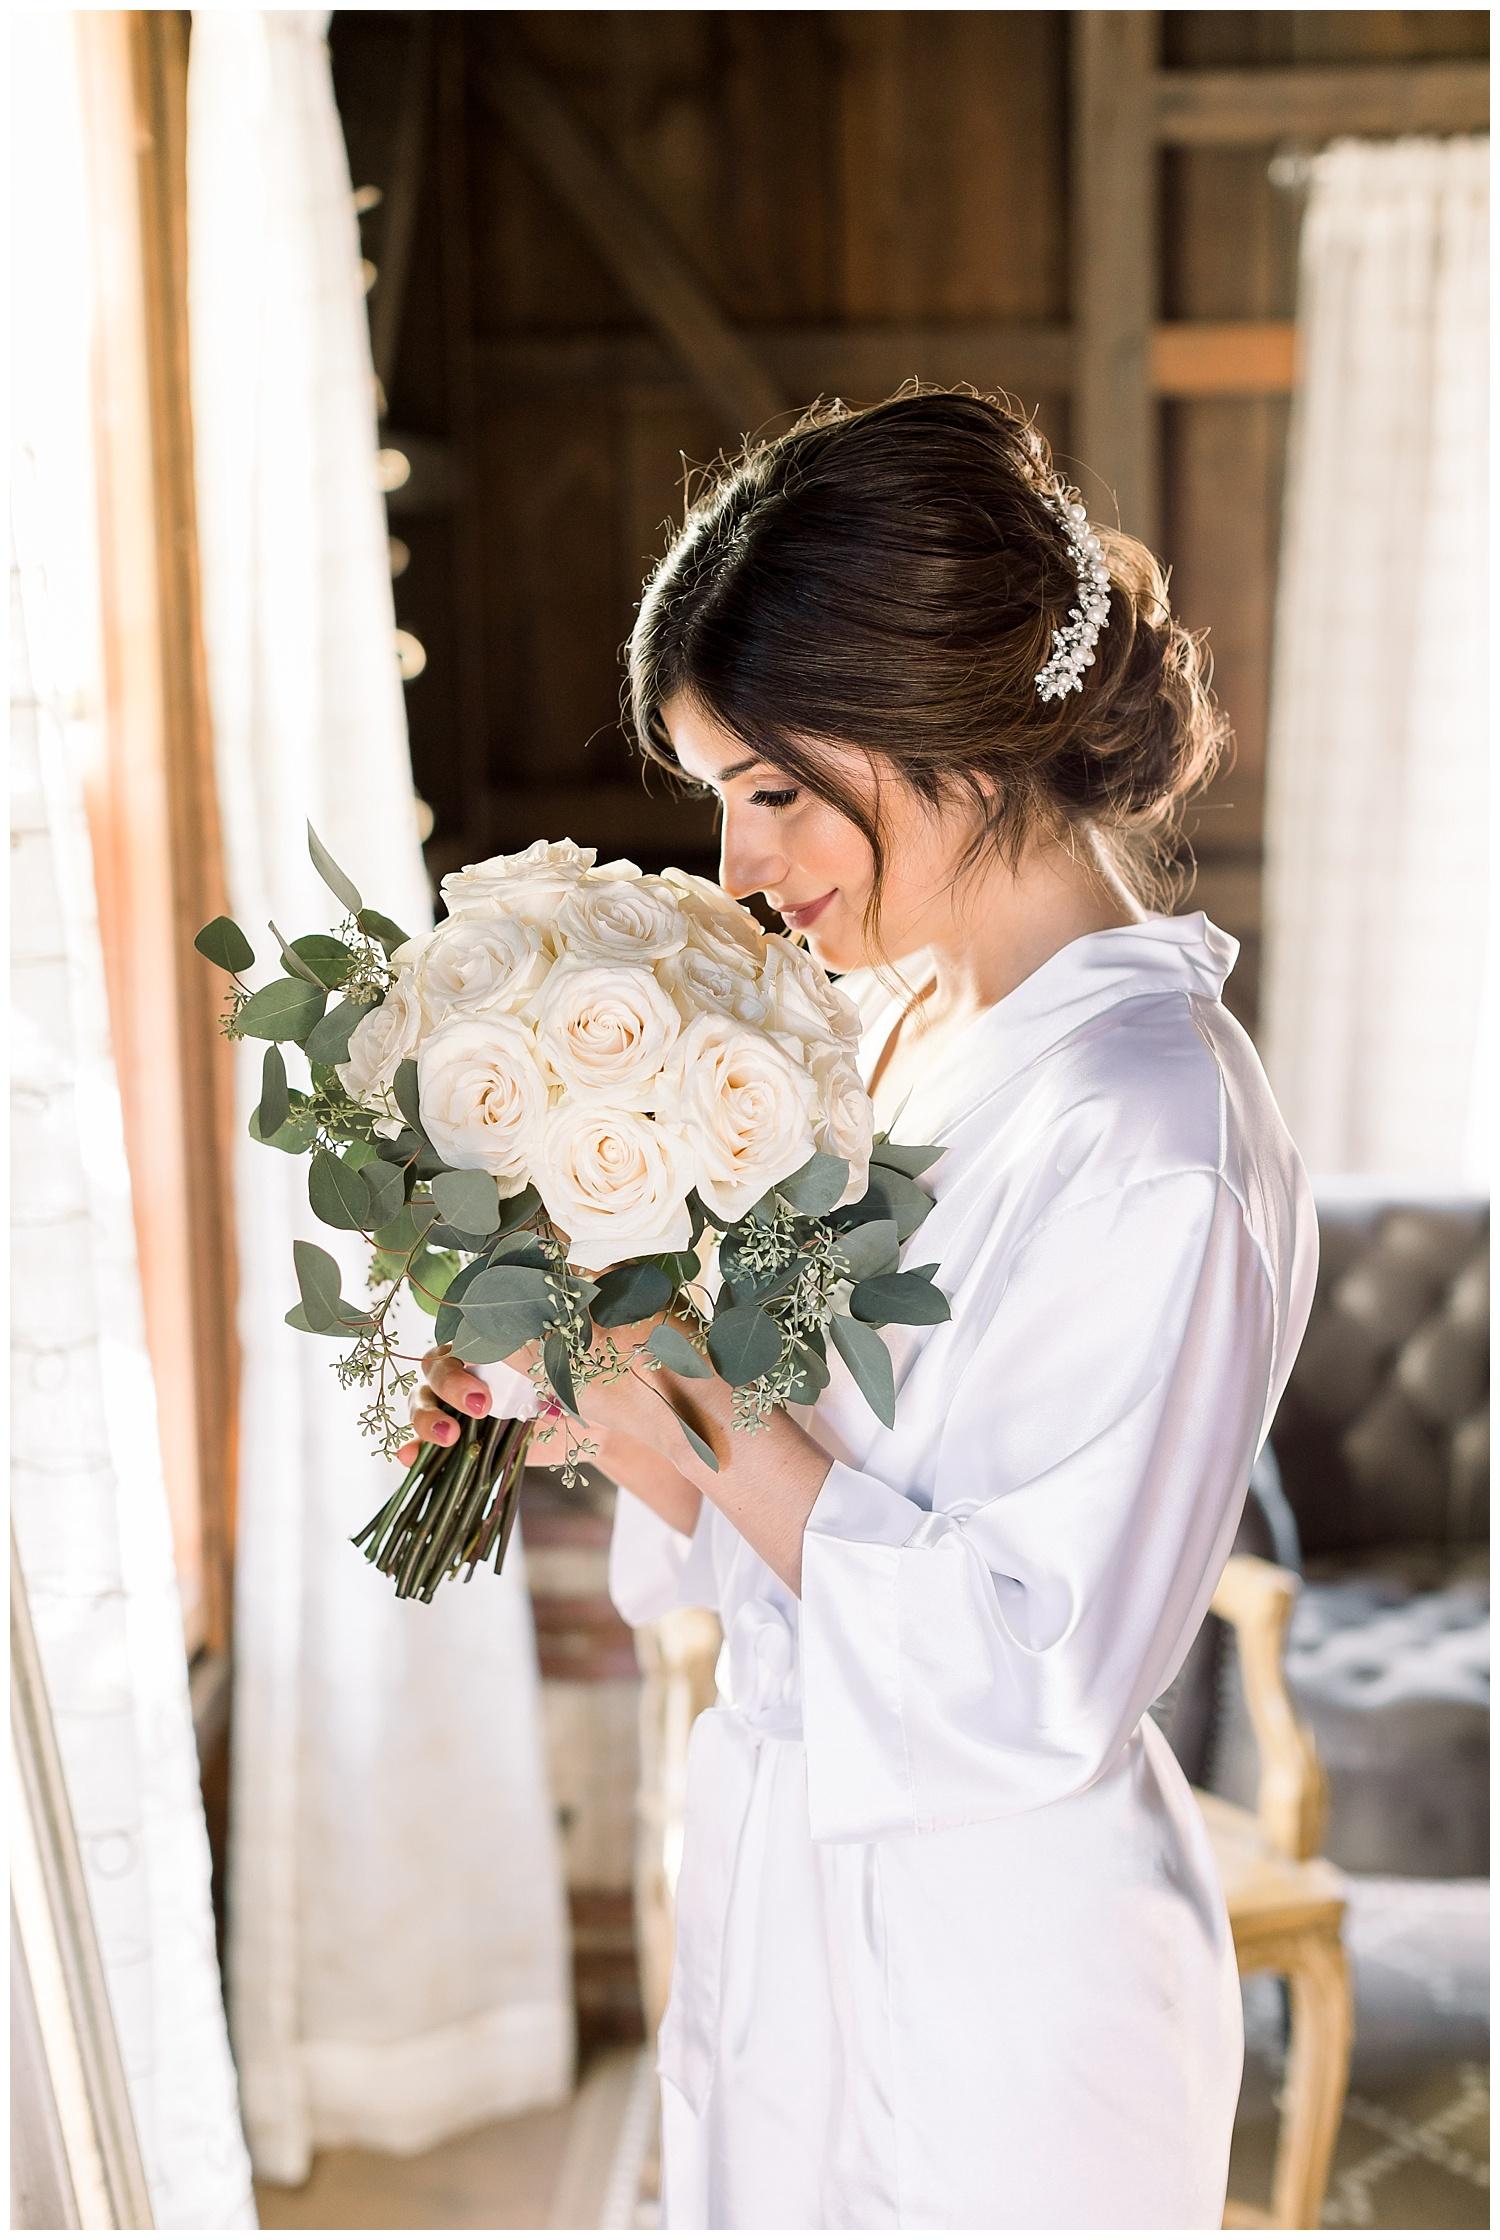 the-barns-cooper-molera-pre-wedding-bride-getting-ready-ags-photoart.jpg